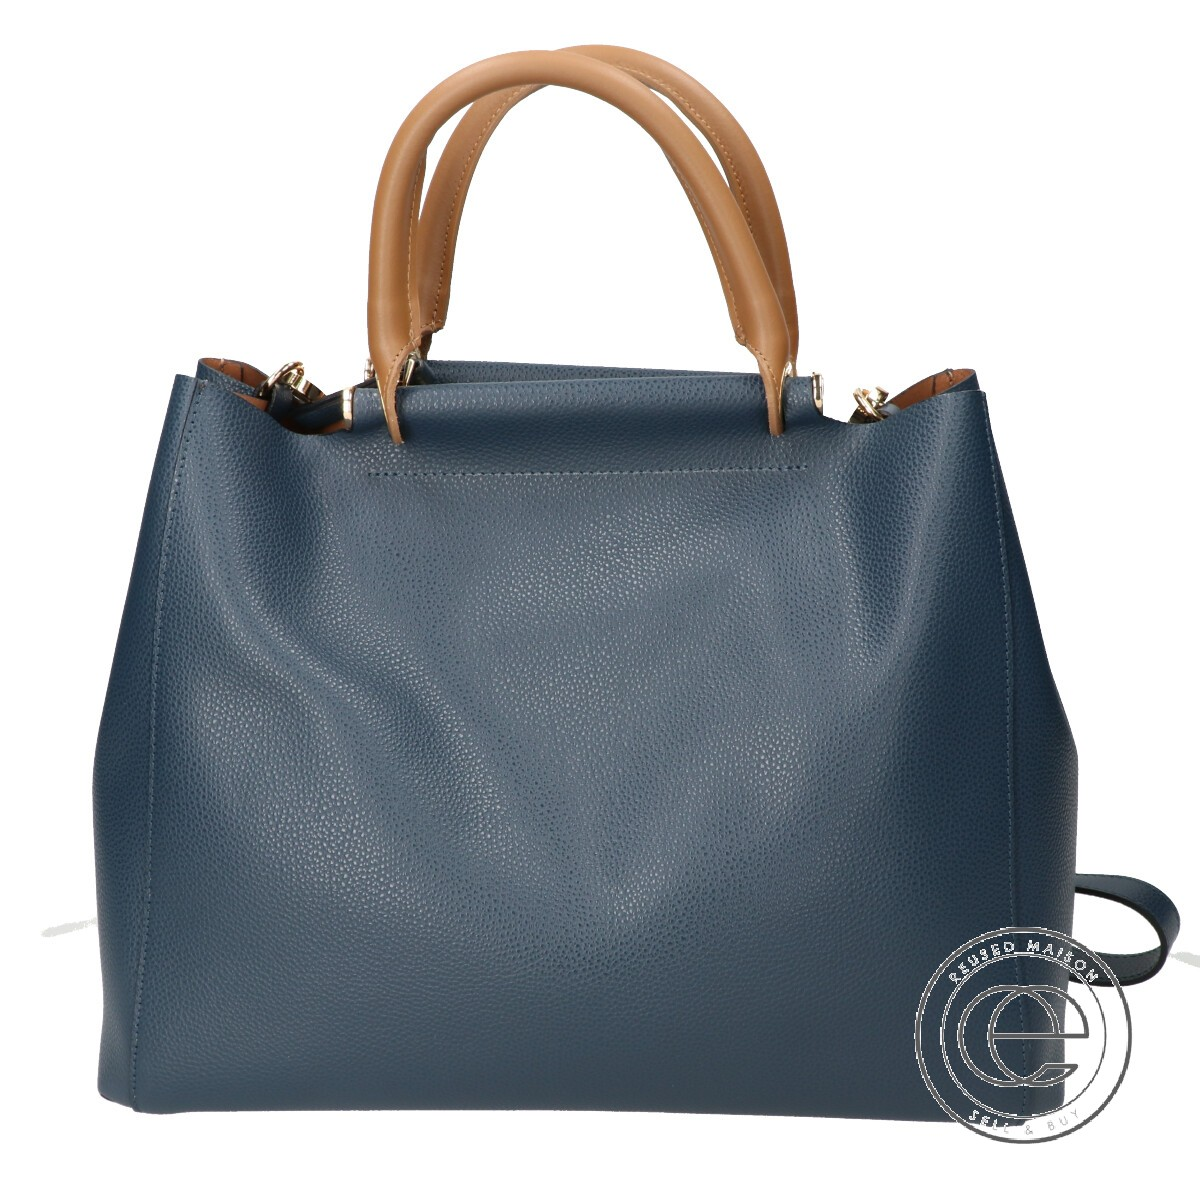 new arrivals wholesale dealer quality design GIANNI NOTARO ジャンニノターロ ART909 partition porch 2WAY shoulder handbag navy  Lady's belonging to